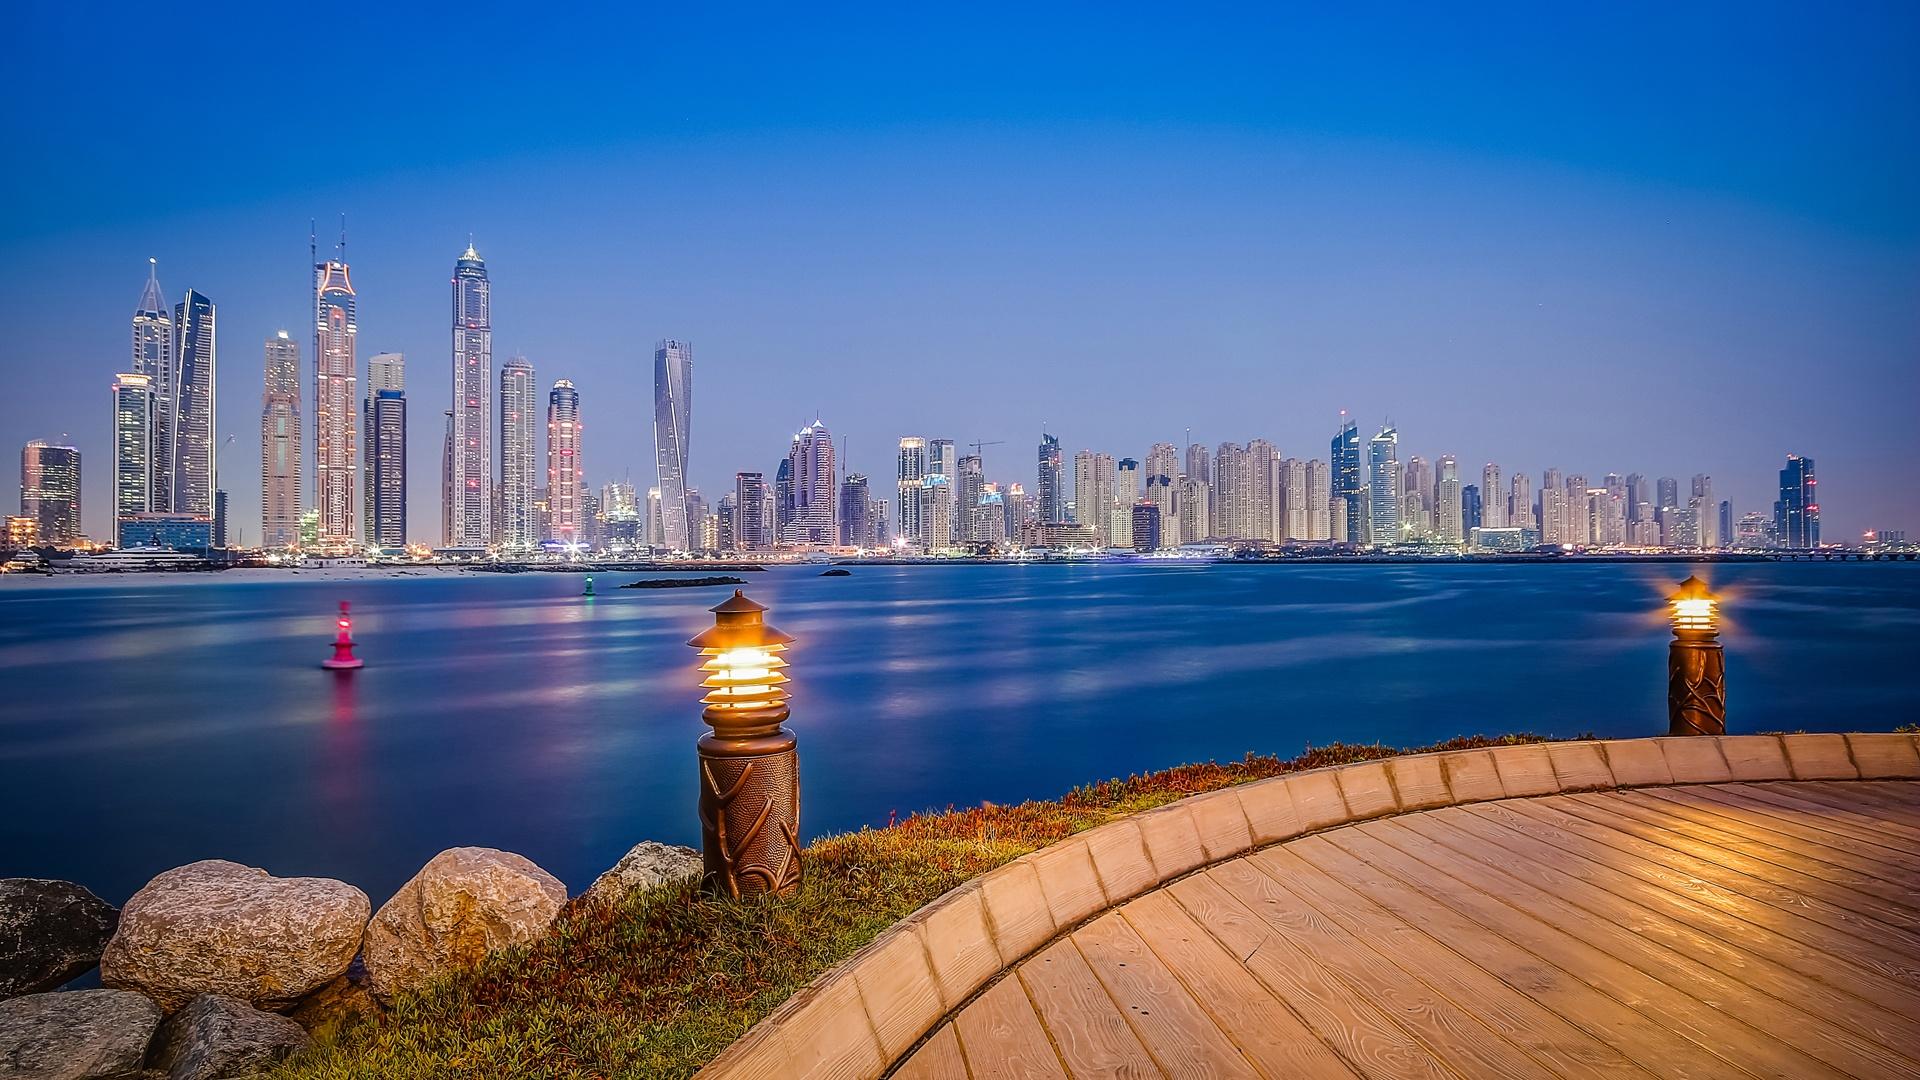 Dubai hd wallpaper 1080